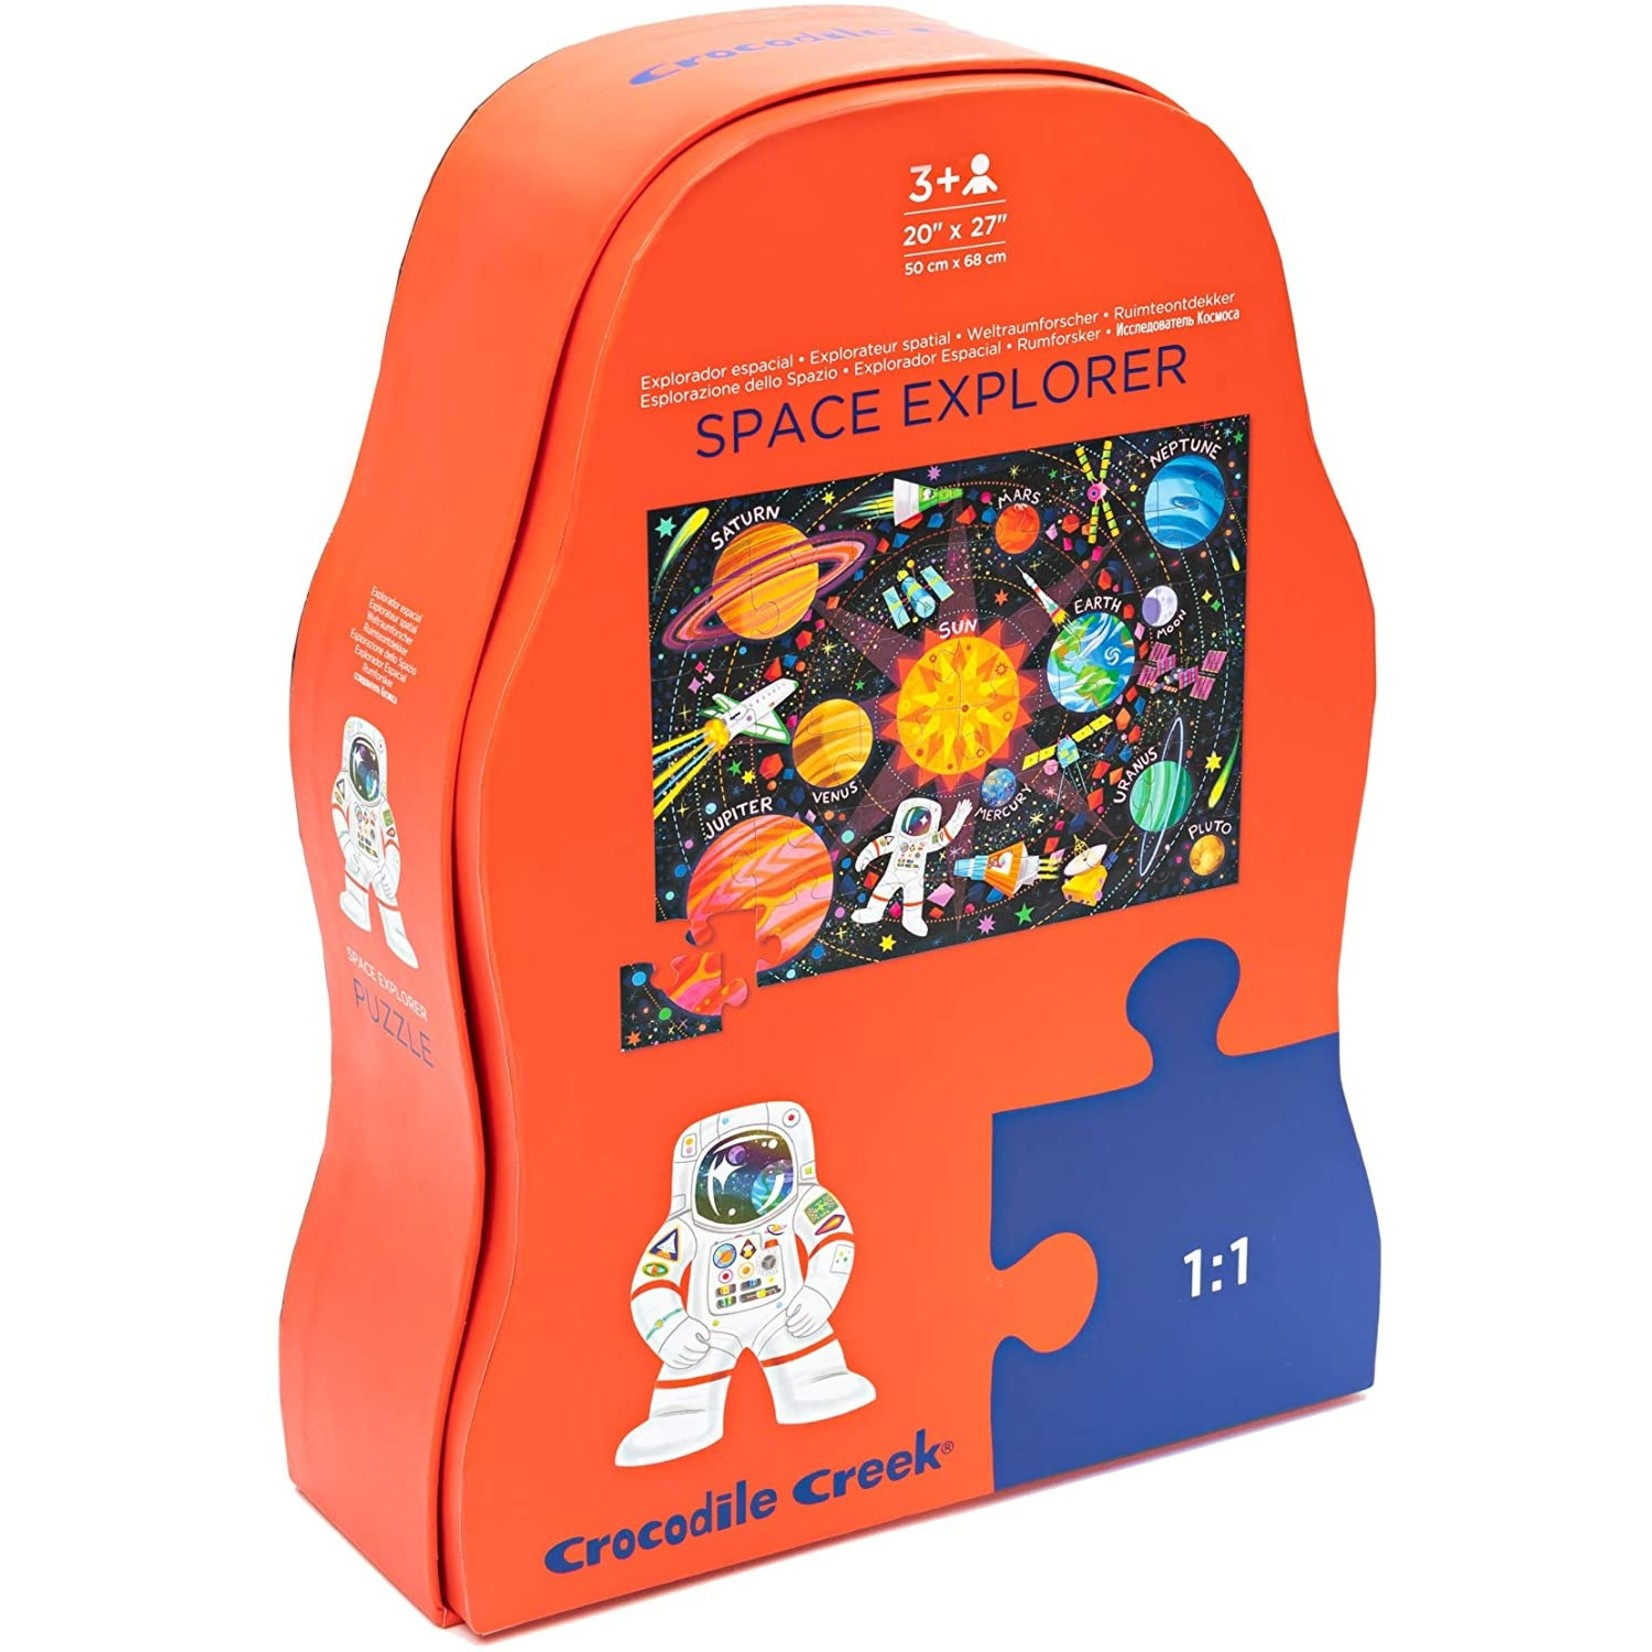 CROCODILE CREEK SPACE EXPLORER PUZZLE